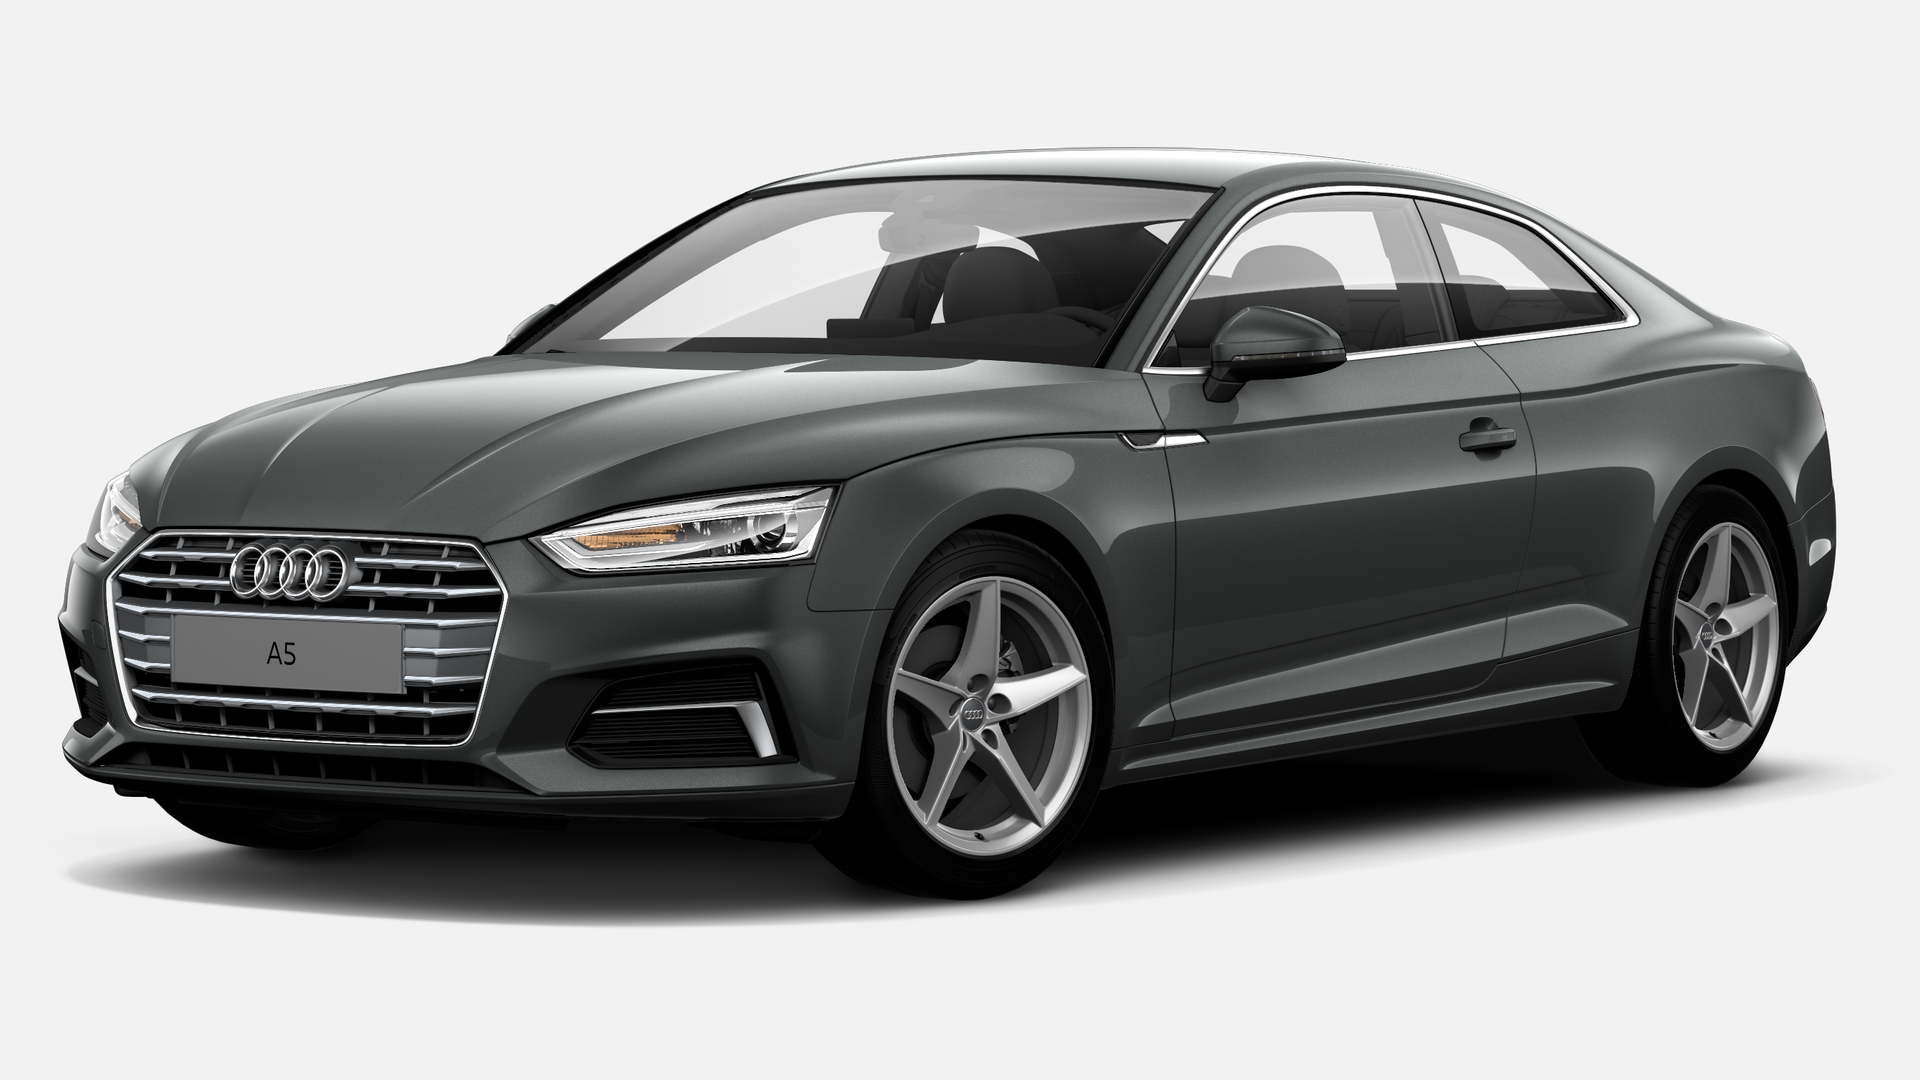 Audi A5 Coupe 2.0 TFSI S line MHEV S tron 140 kW (190 CV)